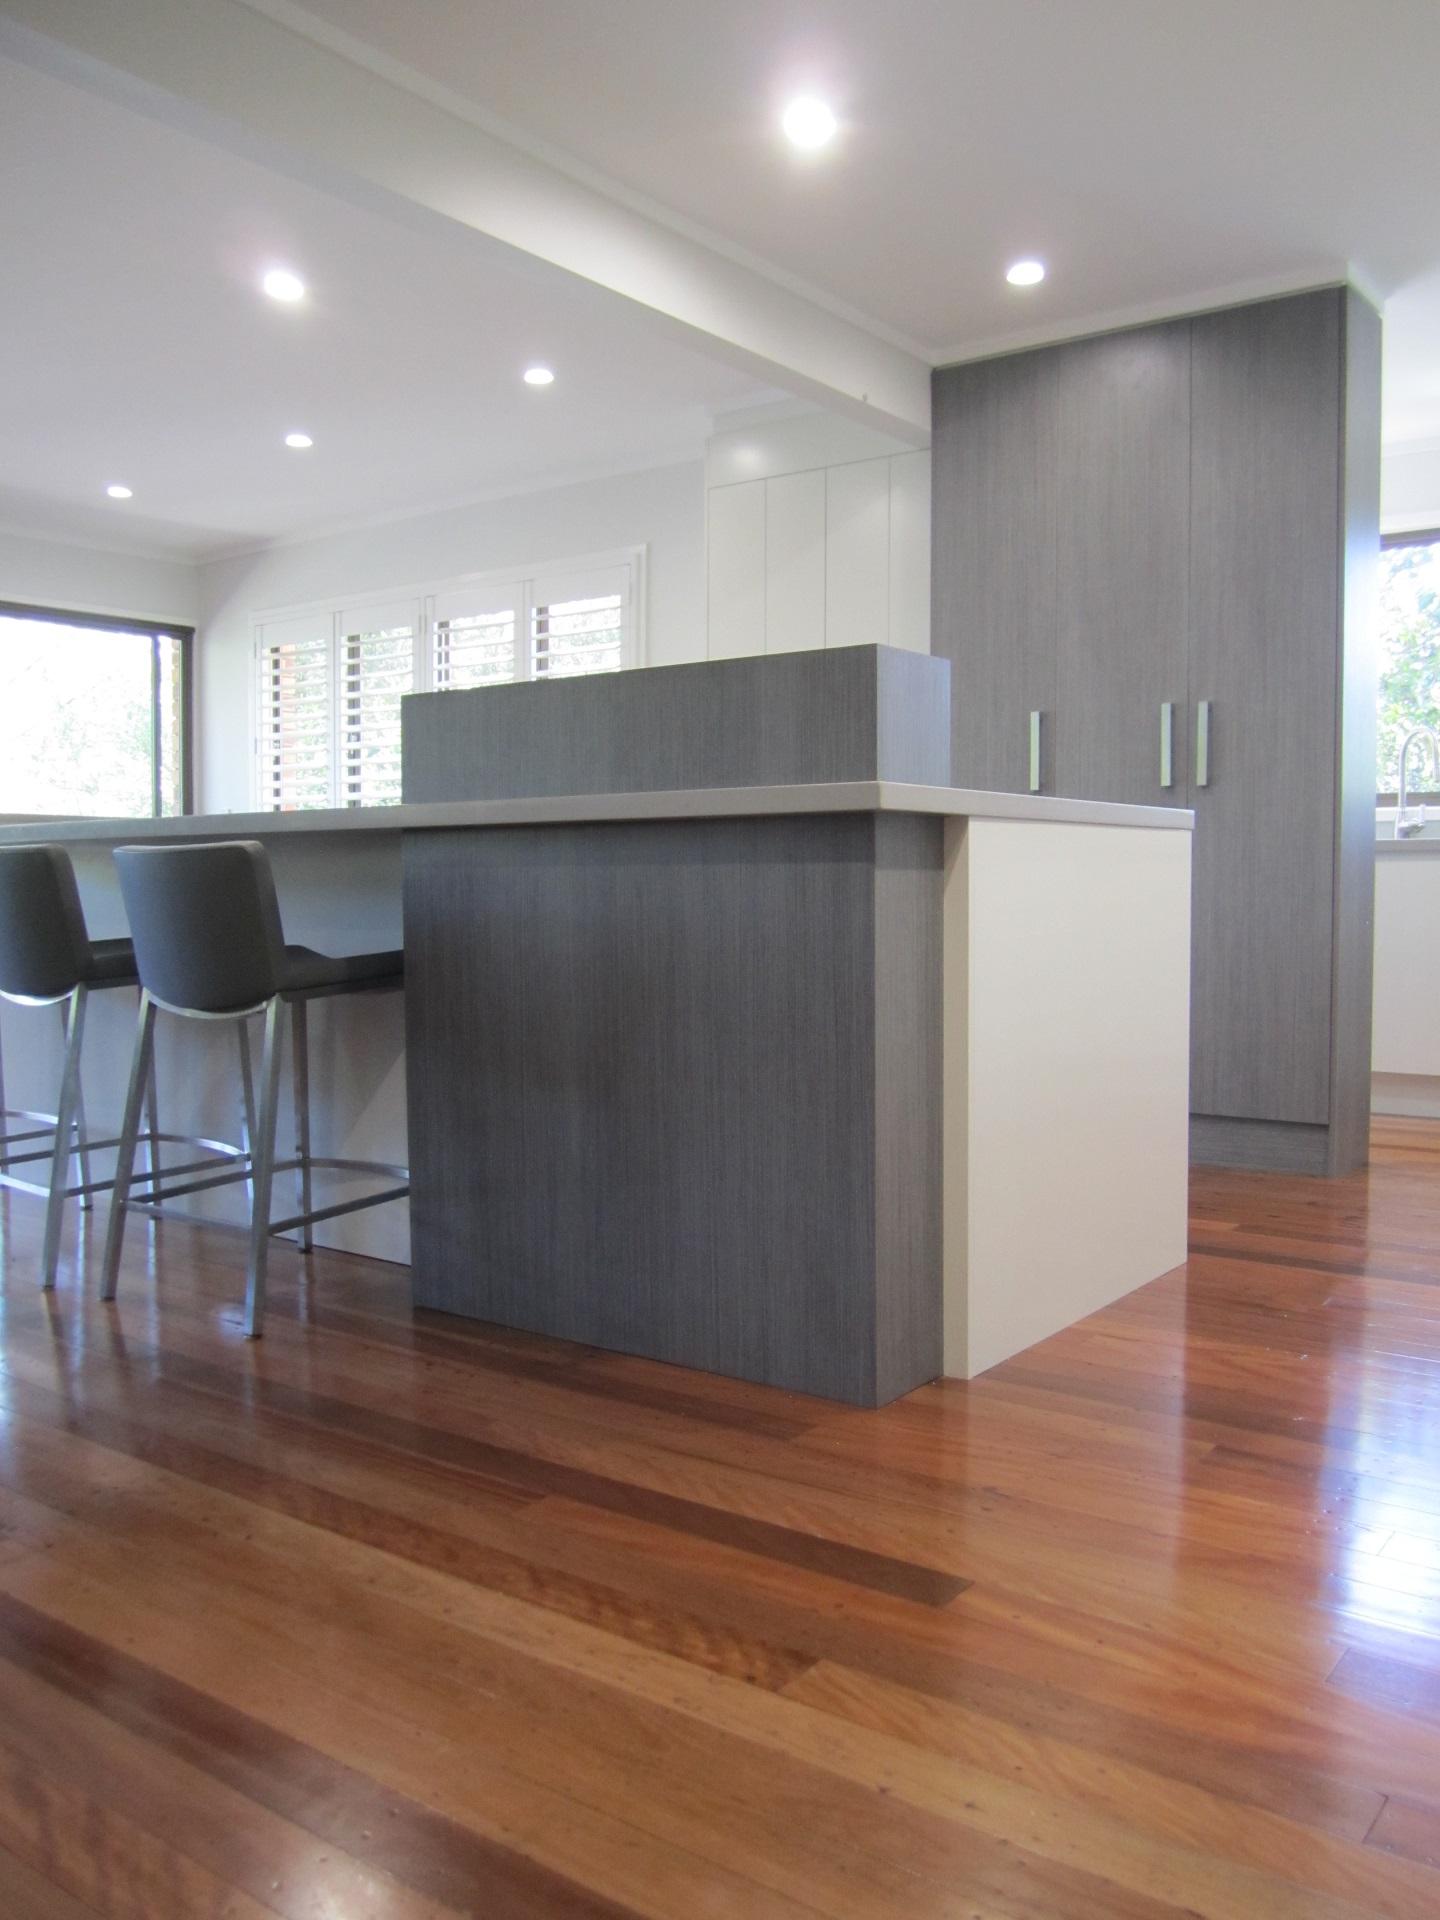 Brisbane Kitchen Design Kenmore Contemporary 2 Tone Island with Raised Servery